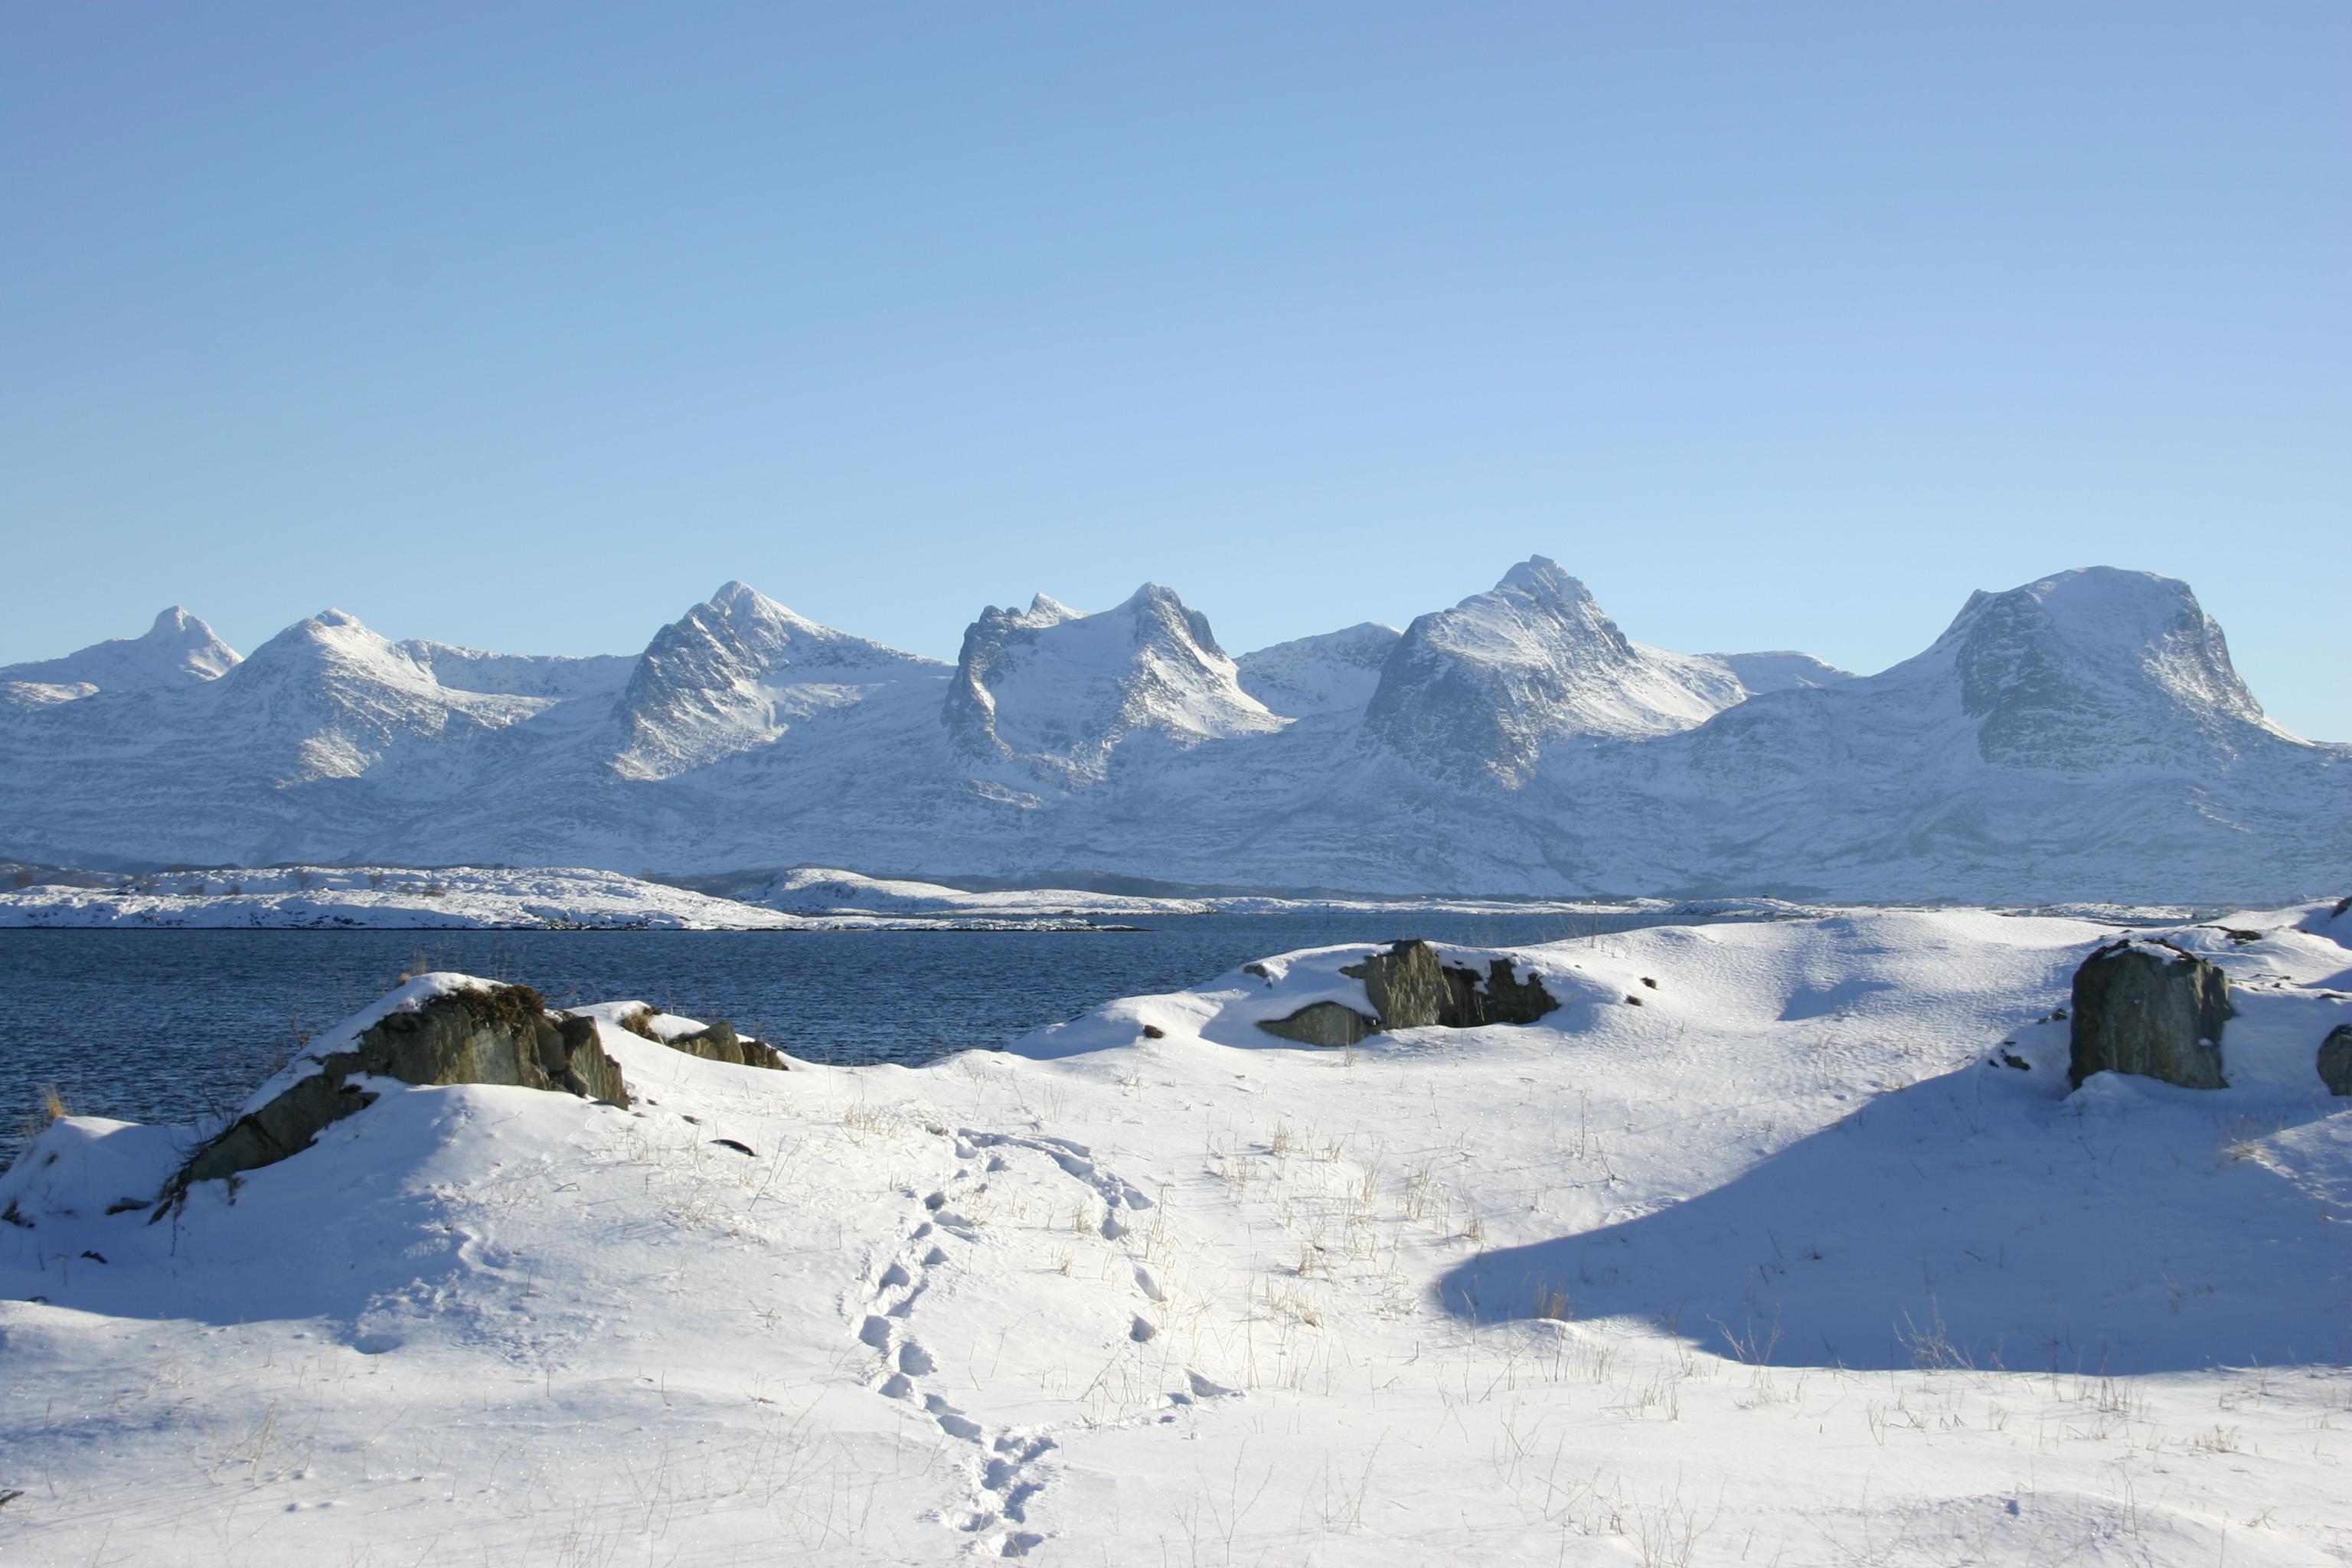 Alstahaug kommune - Helgeland - De syv søstre - Foto: Sigrid Haarberg